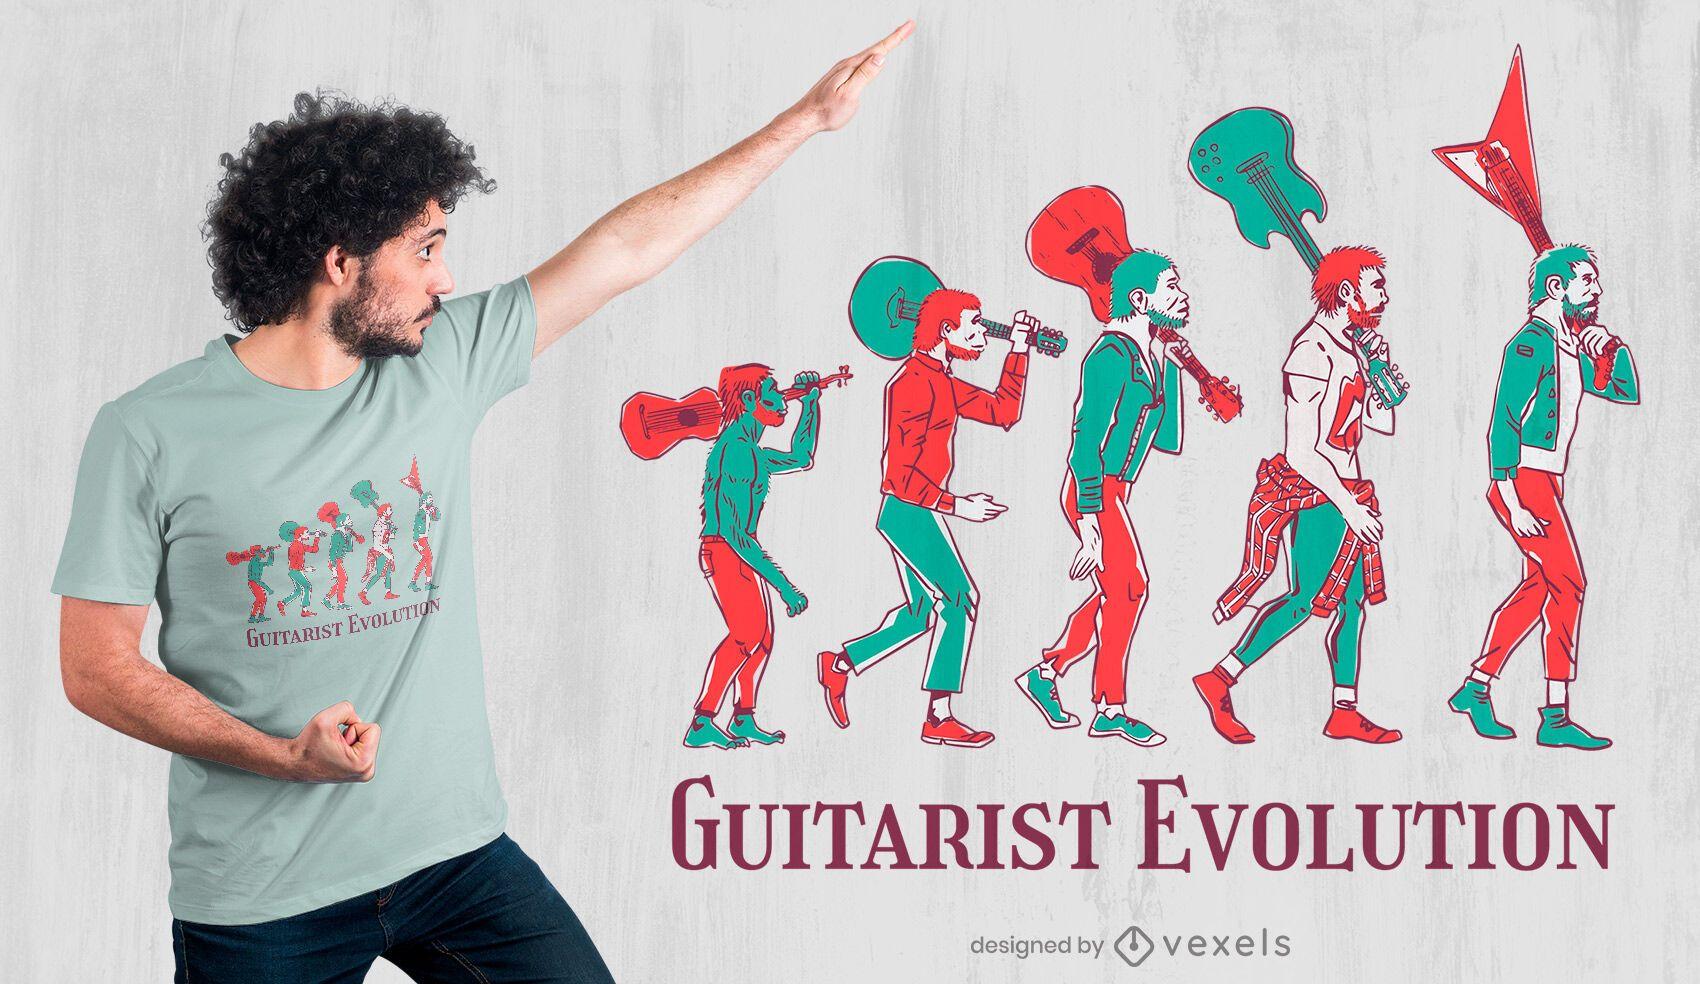 Guitarist evolution t-shirt design